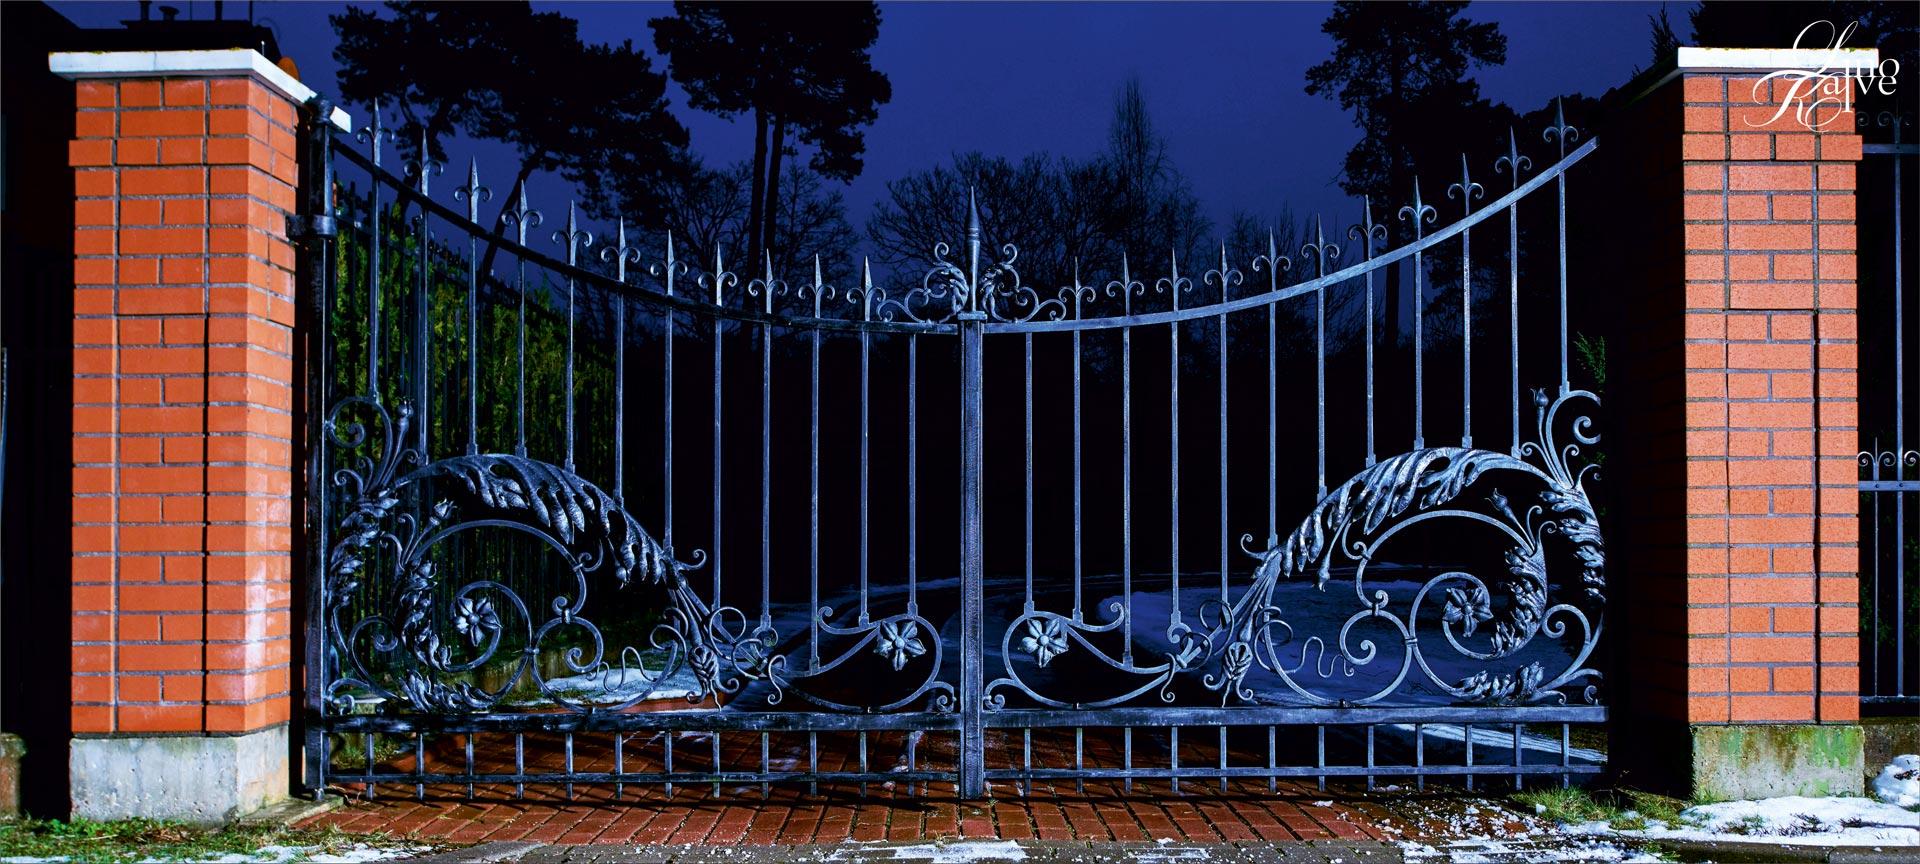 GATES, LIGHTS.